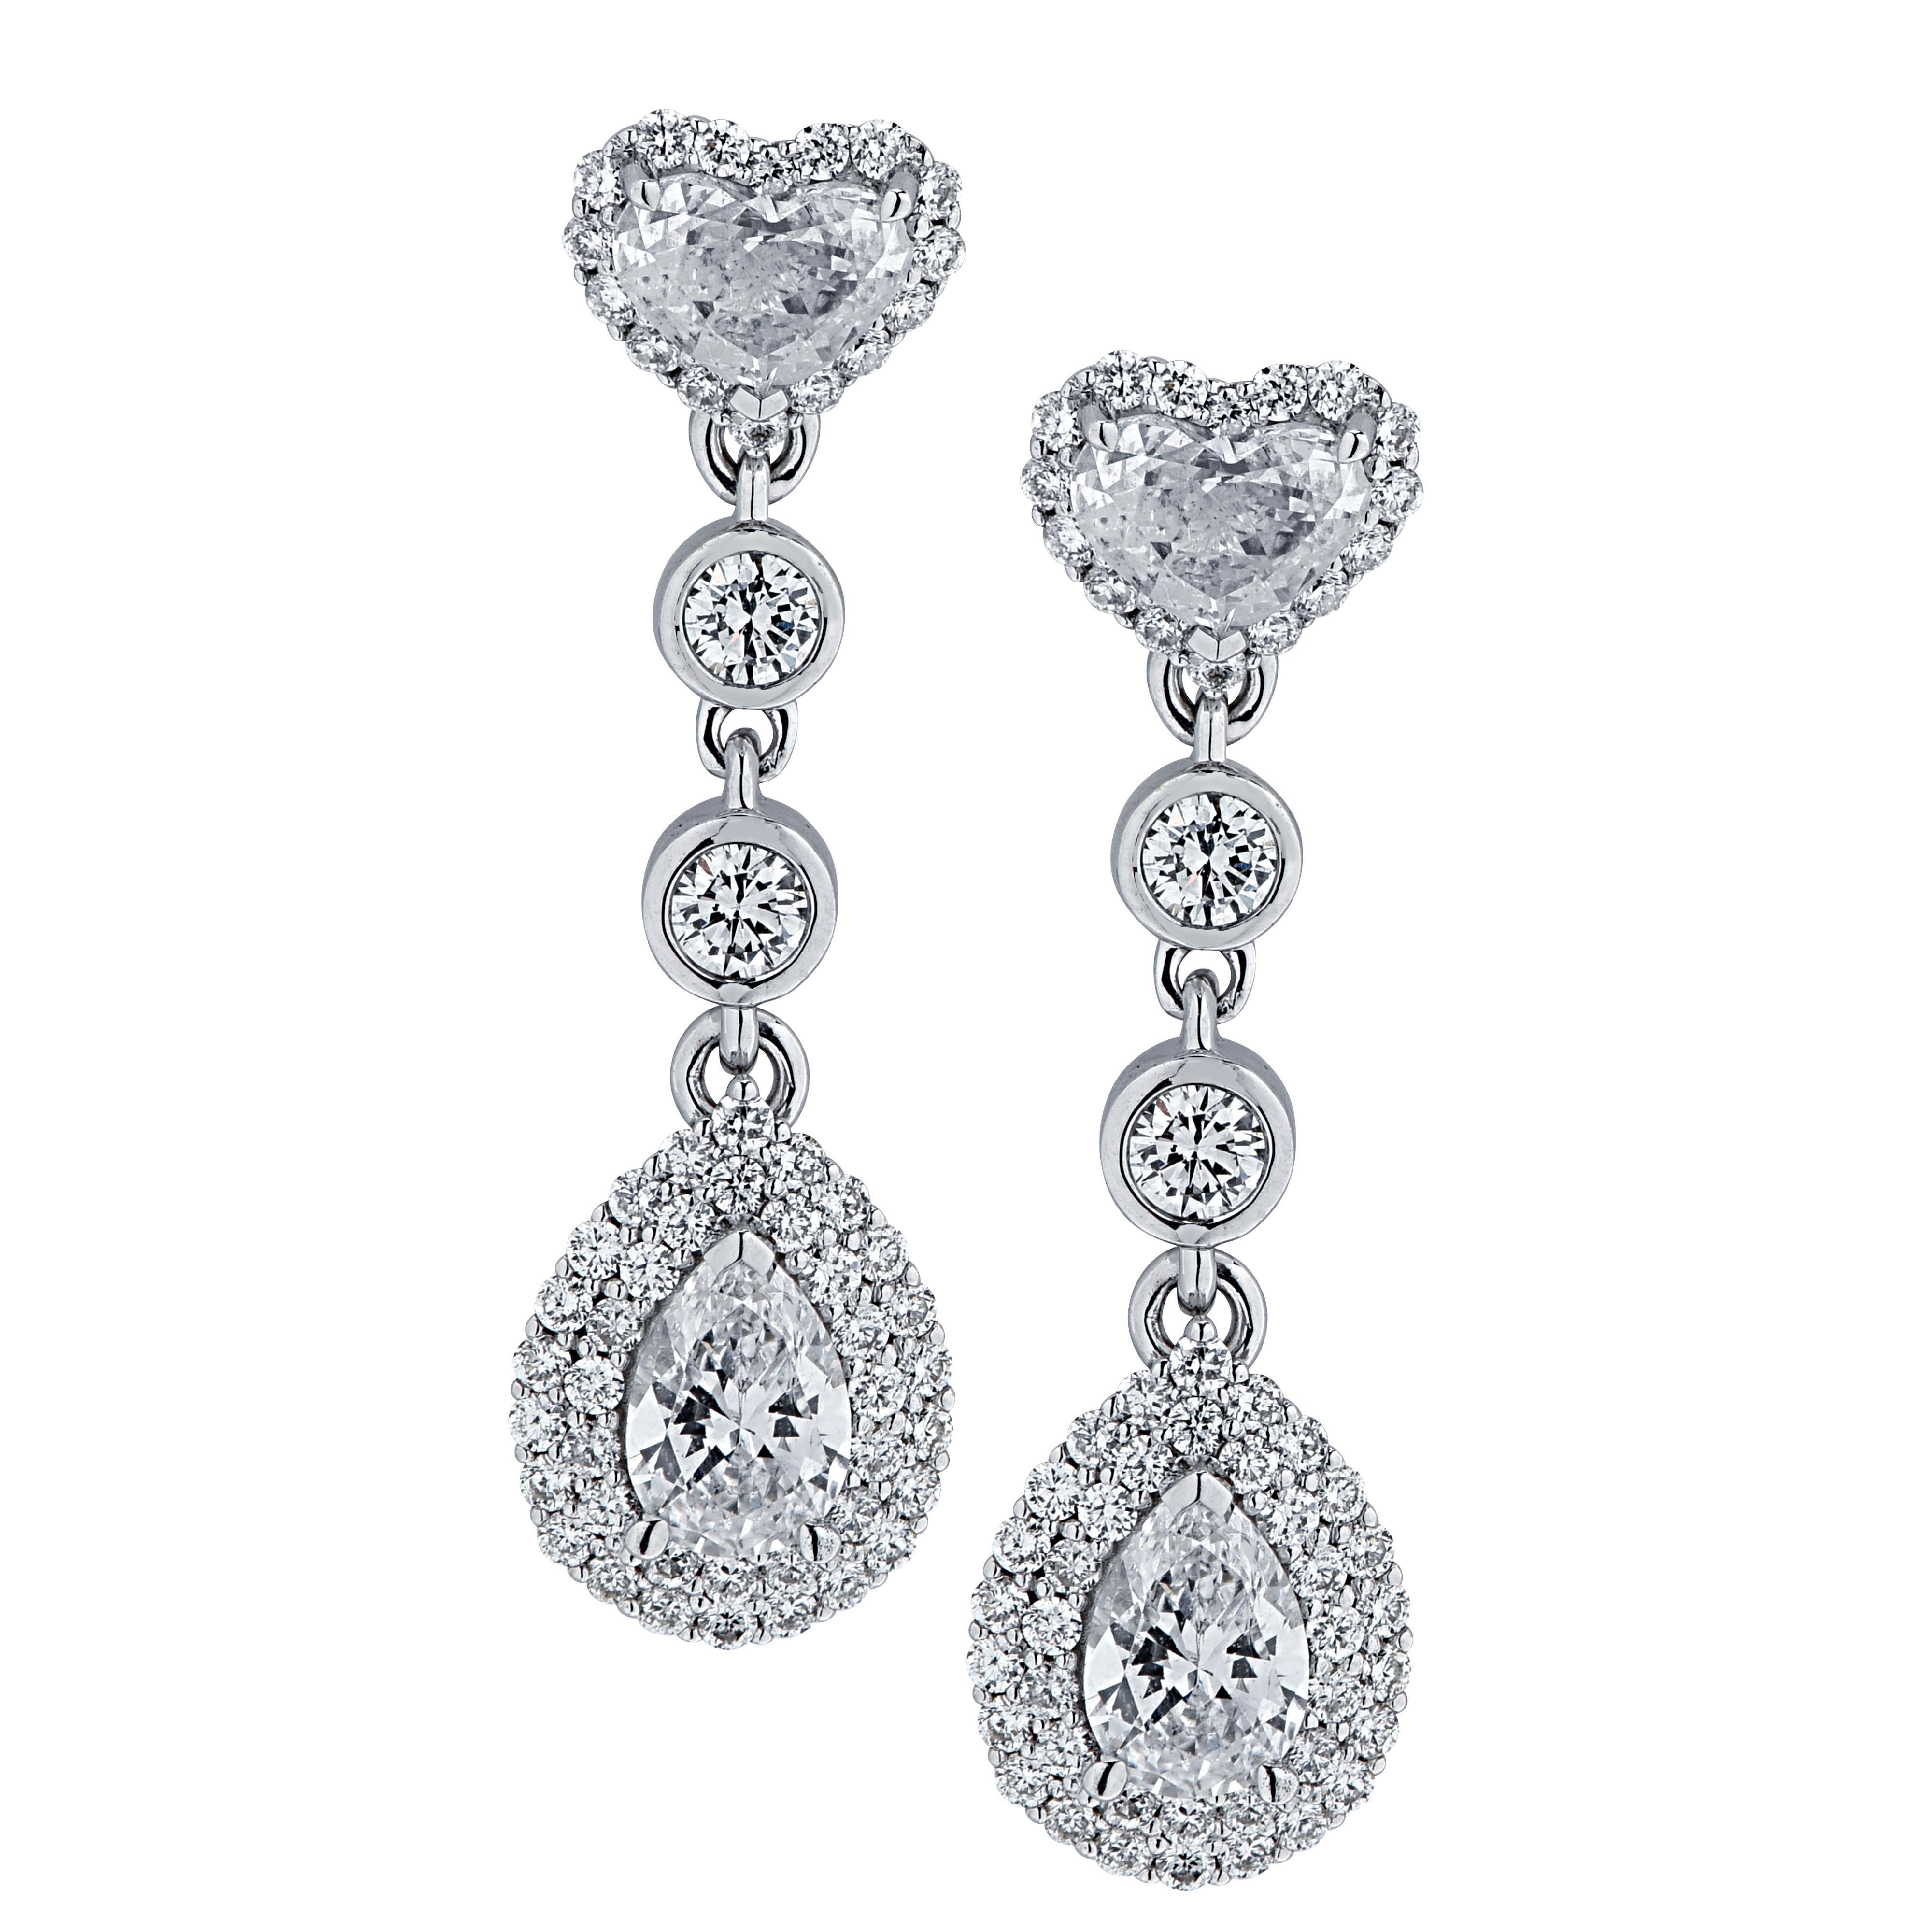 Vivid Diamonds 1.88 Carat Diamond Dangle Earrings